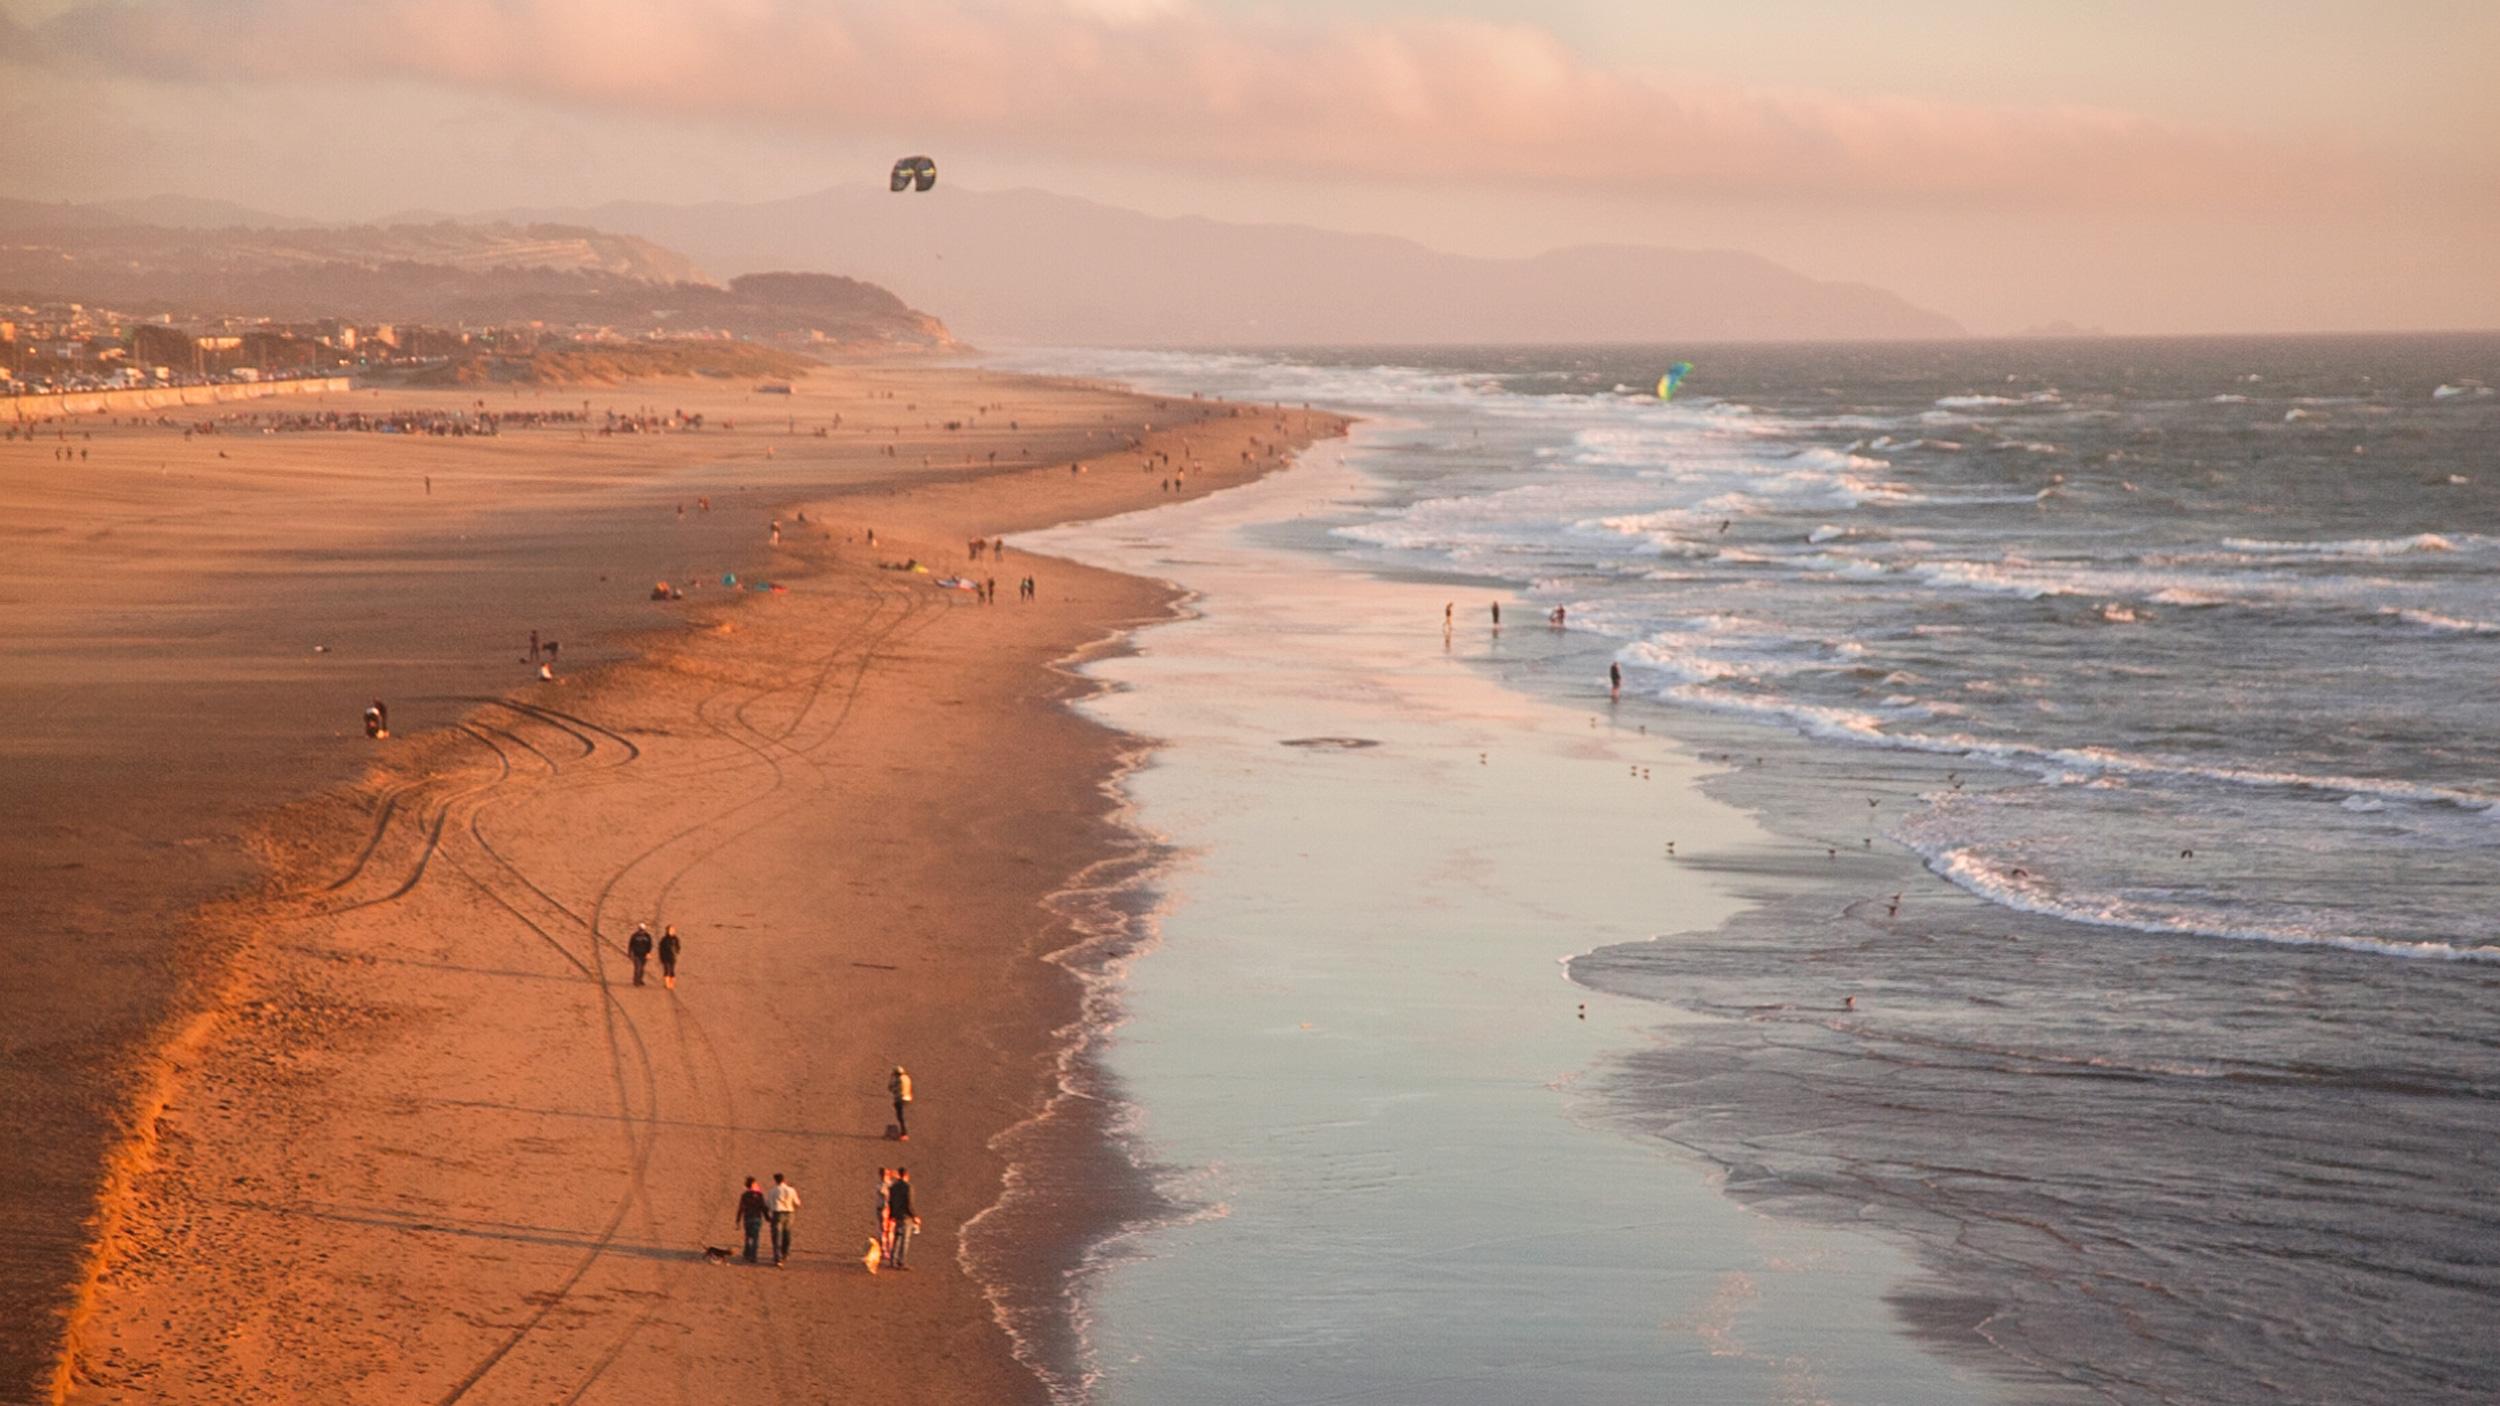 ocean-beach-screengrab.jpg